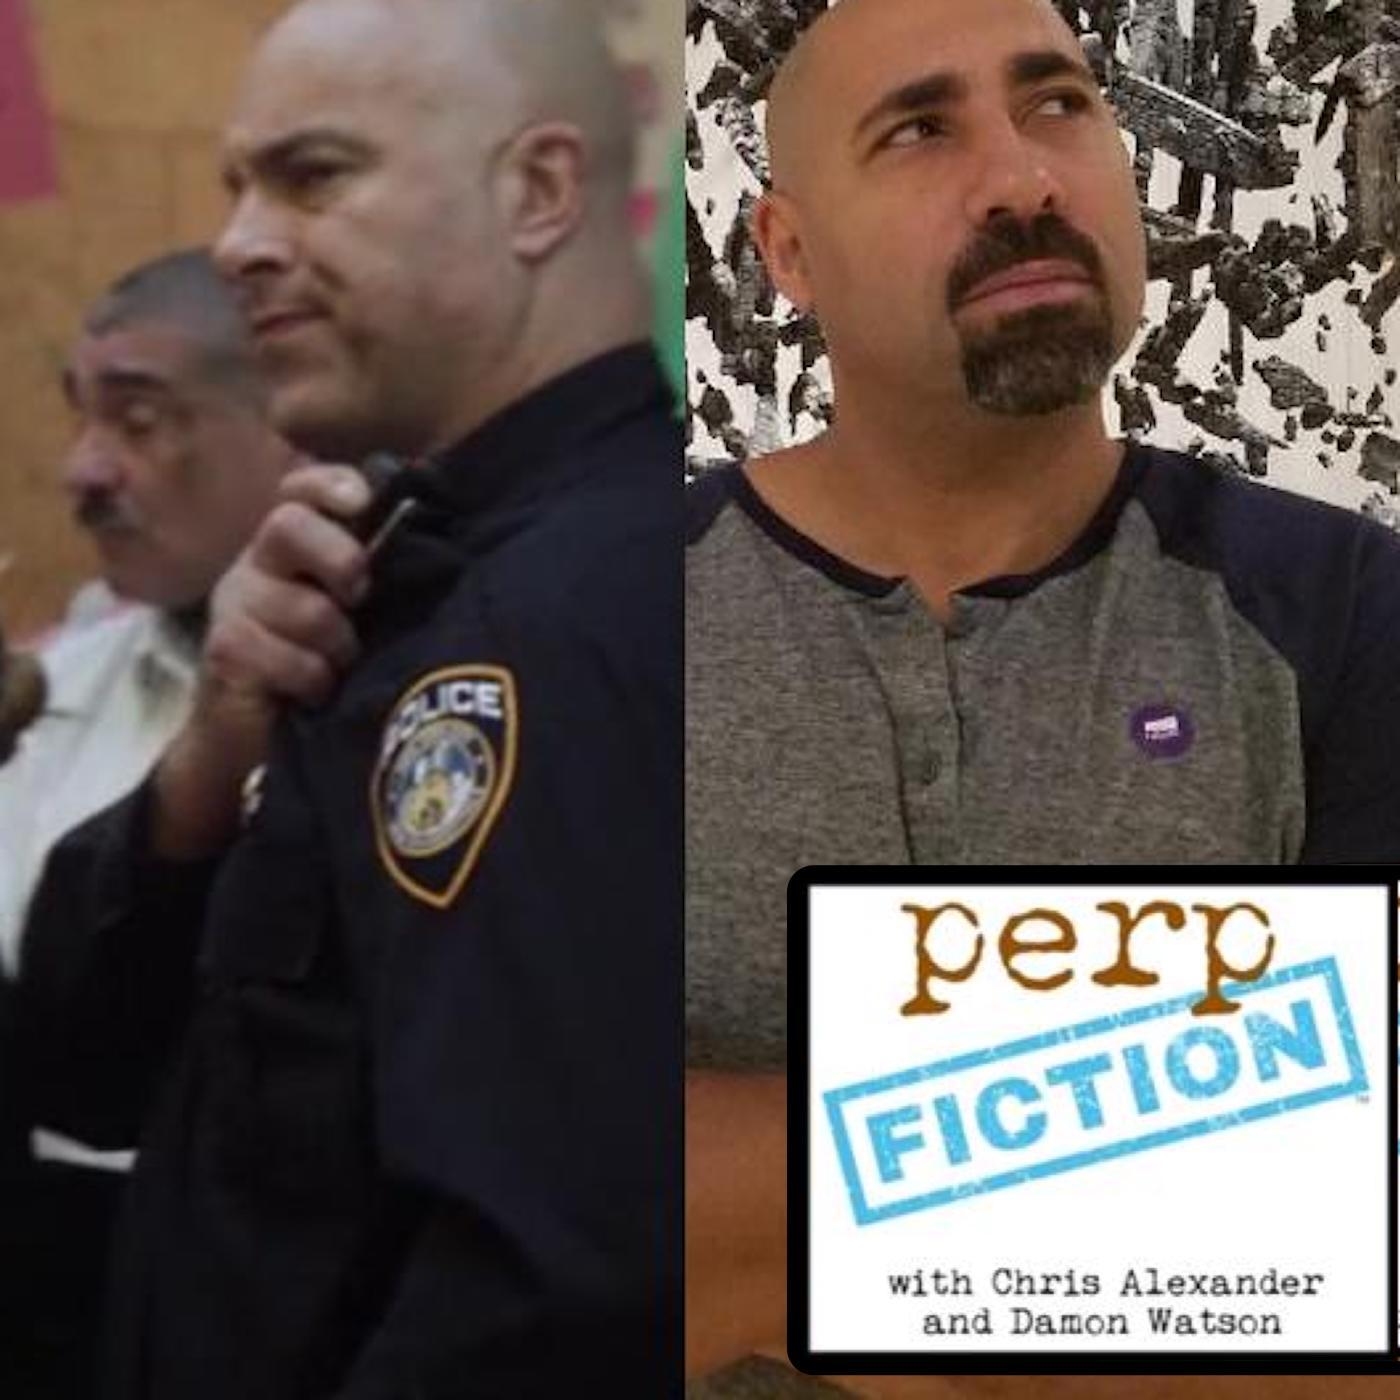 perp fiction